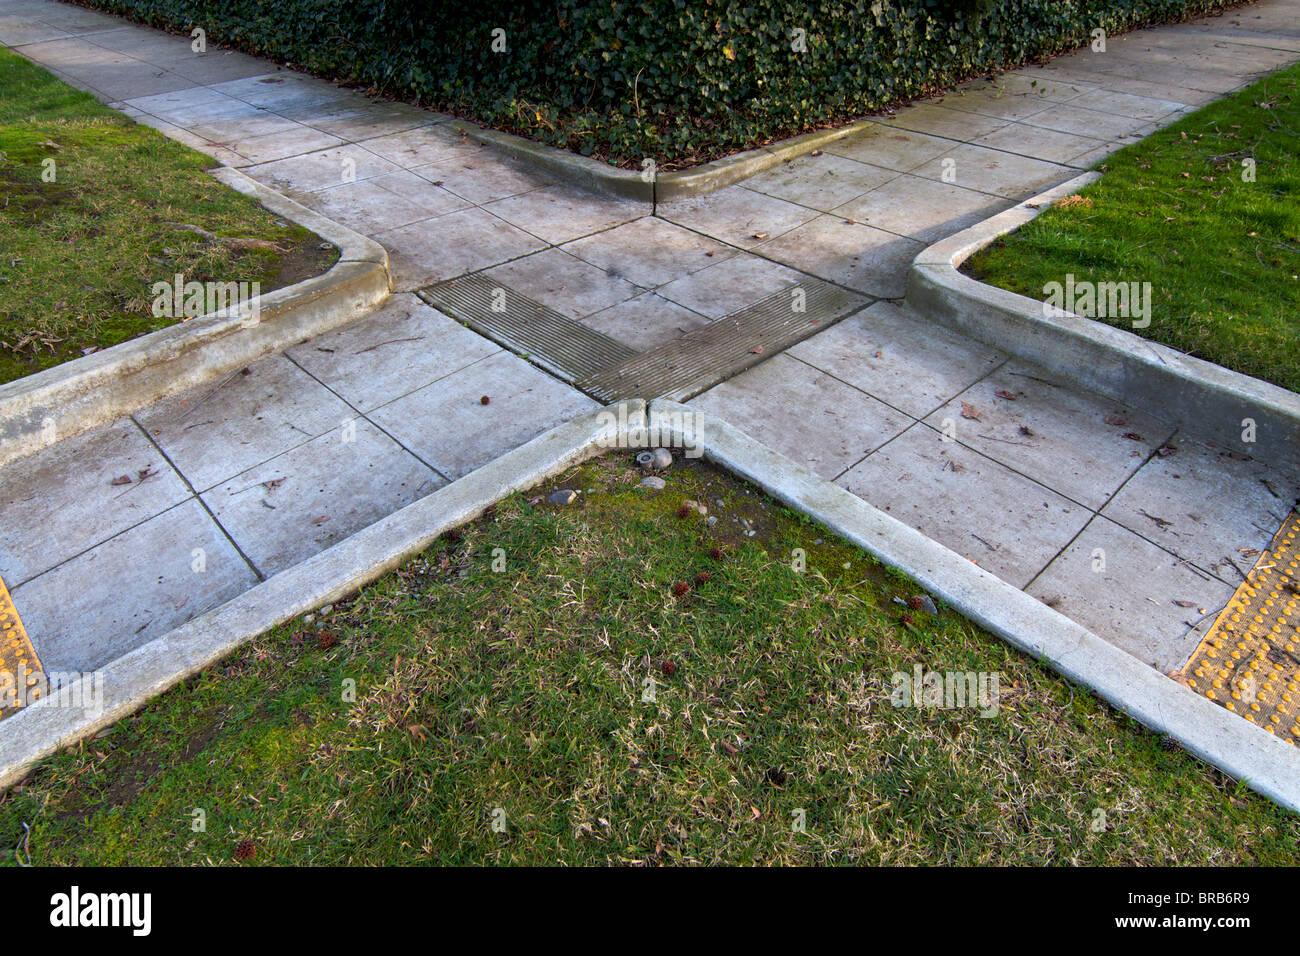 Residential Neighborhood Concrete Sidewalk Crossing Like A